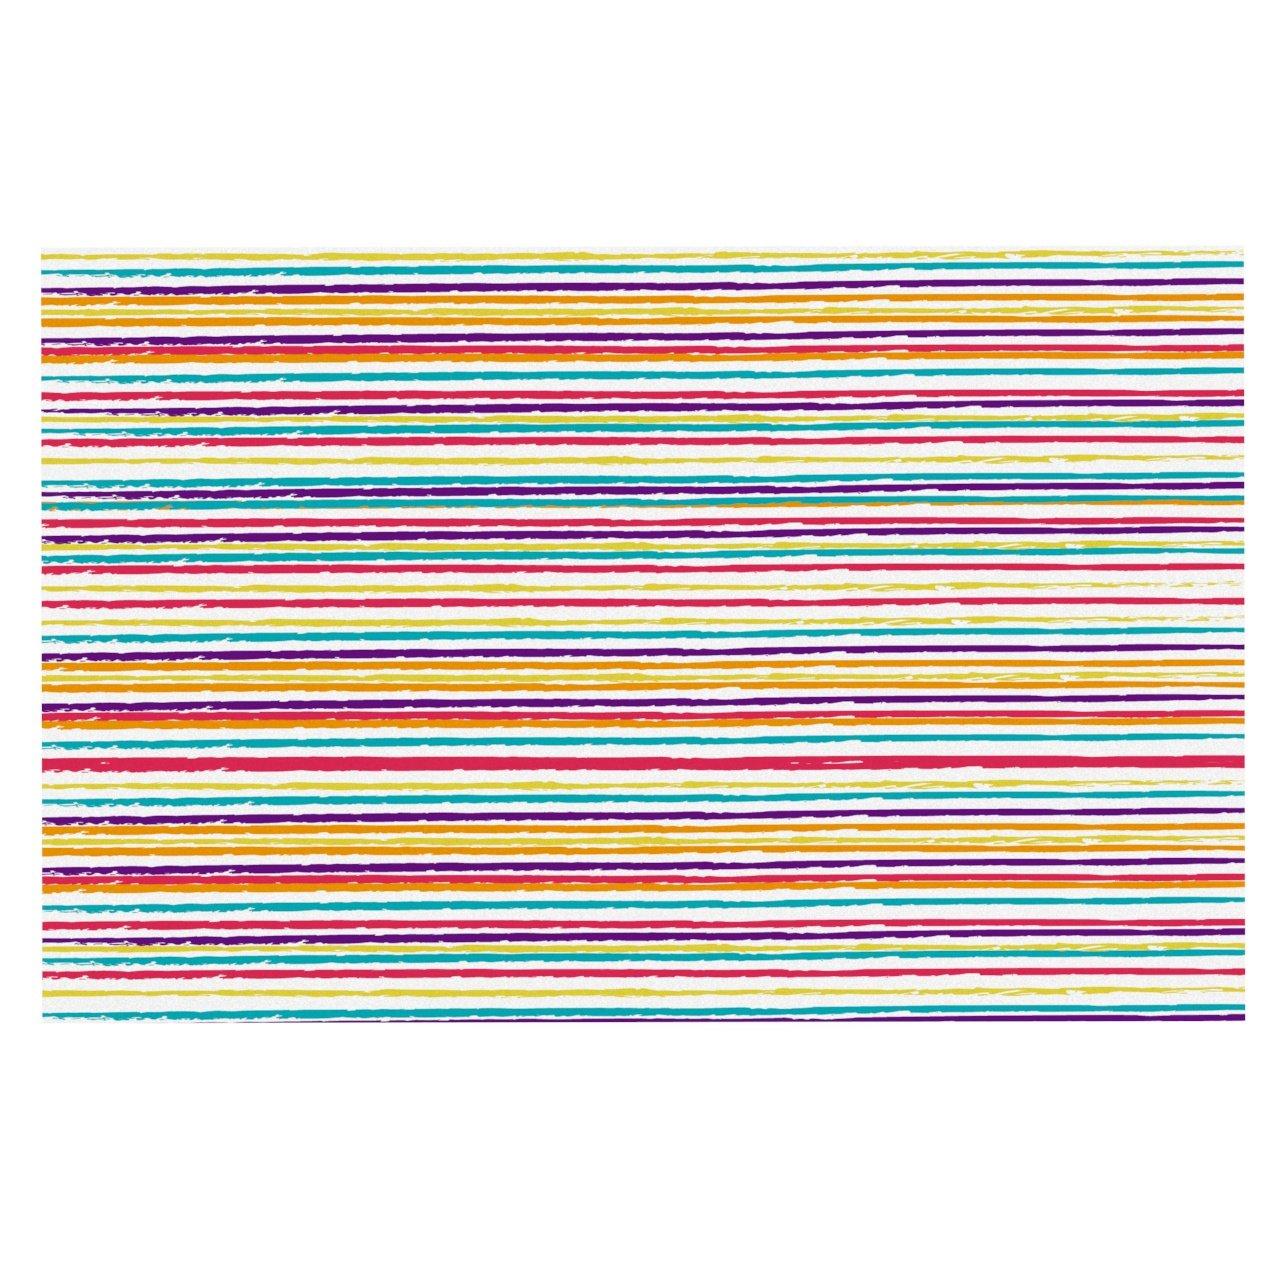 "durable service KESS InHouse MM1048ADM02 Nika Martinez ""Summer Stripes"" Abstract Dog Place Mat, 24"" x 15"""